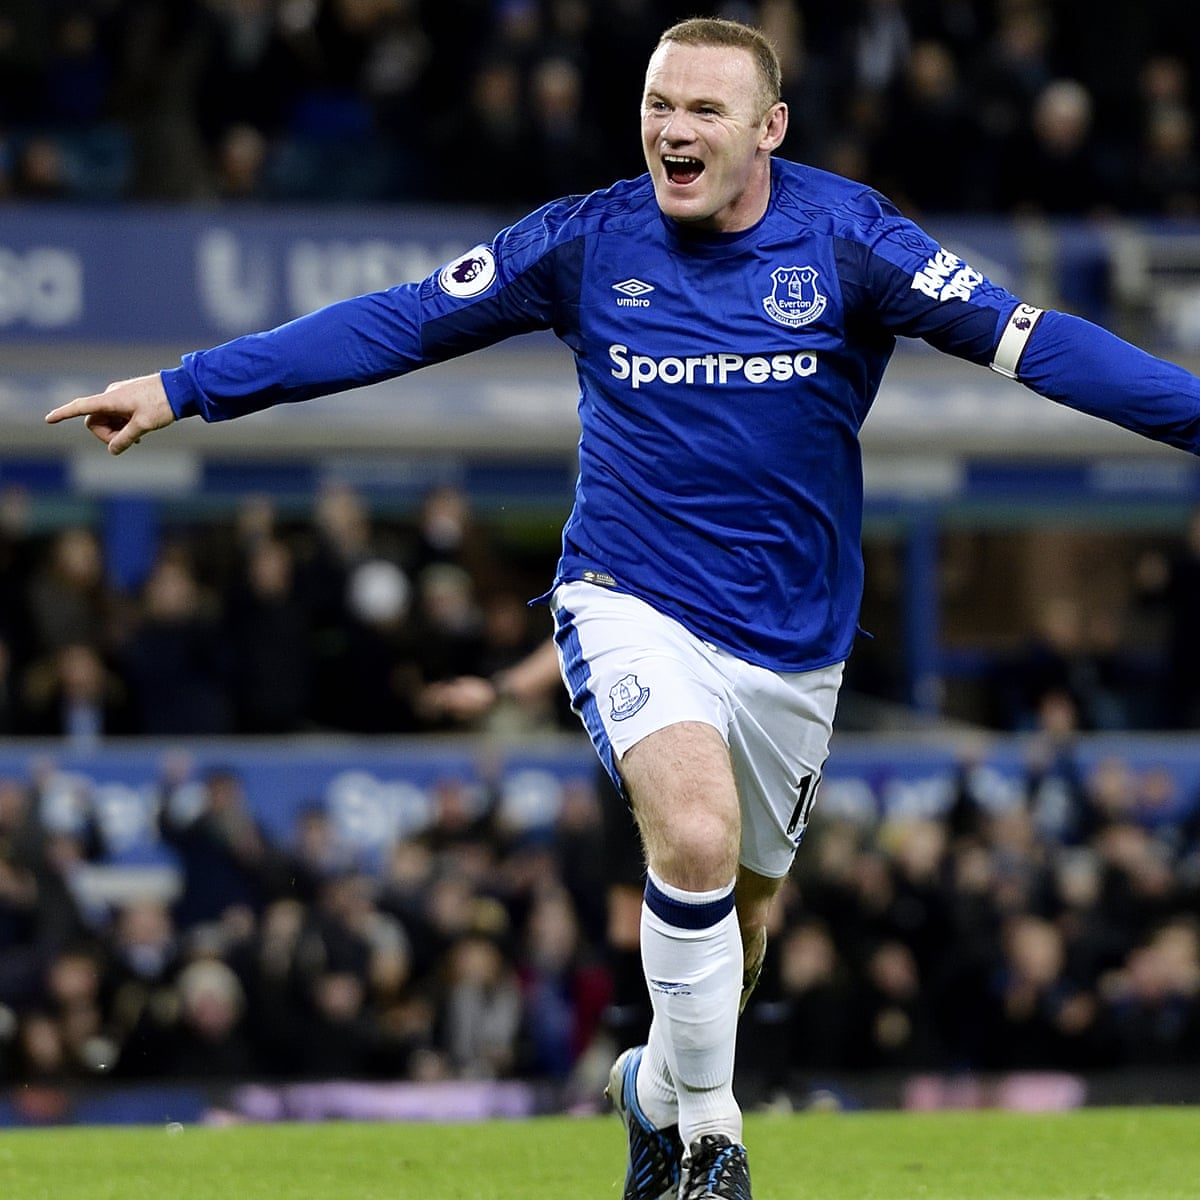 Sam Allardyce Watches On As Wayne Rooney Hat Trick Seals Rare Everton Win Premier League The Guardian